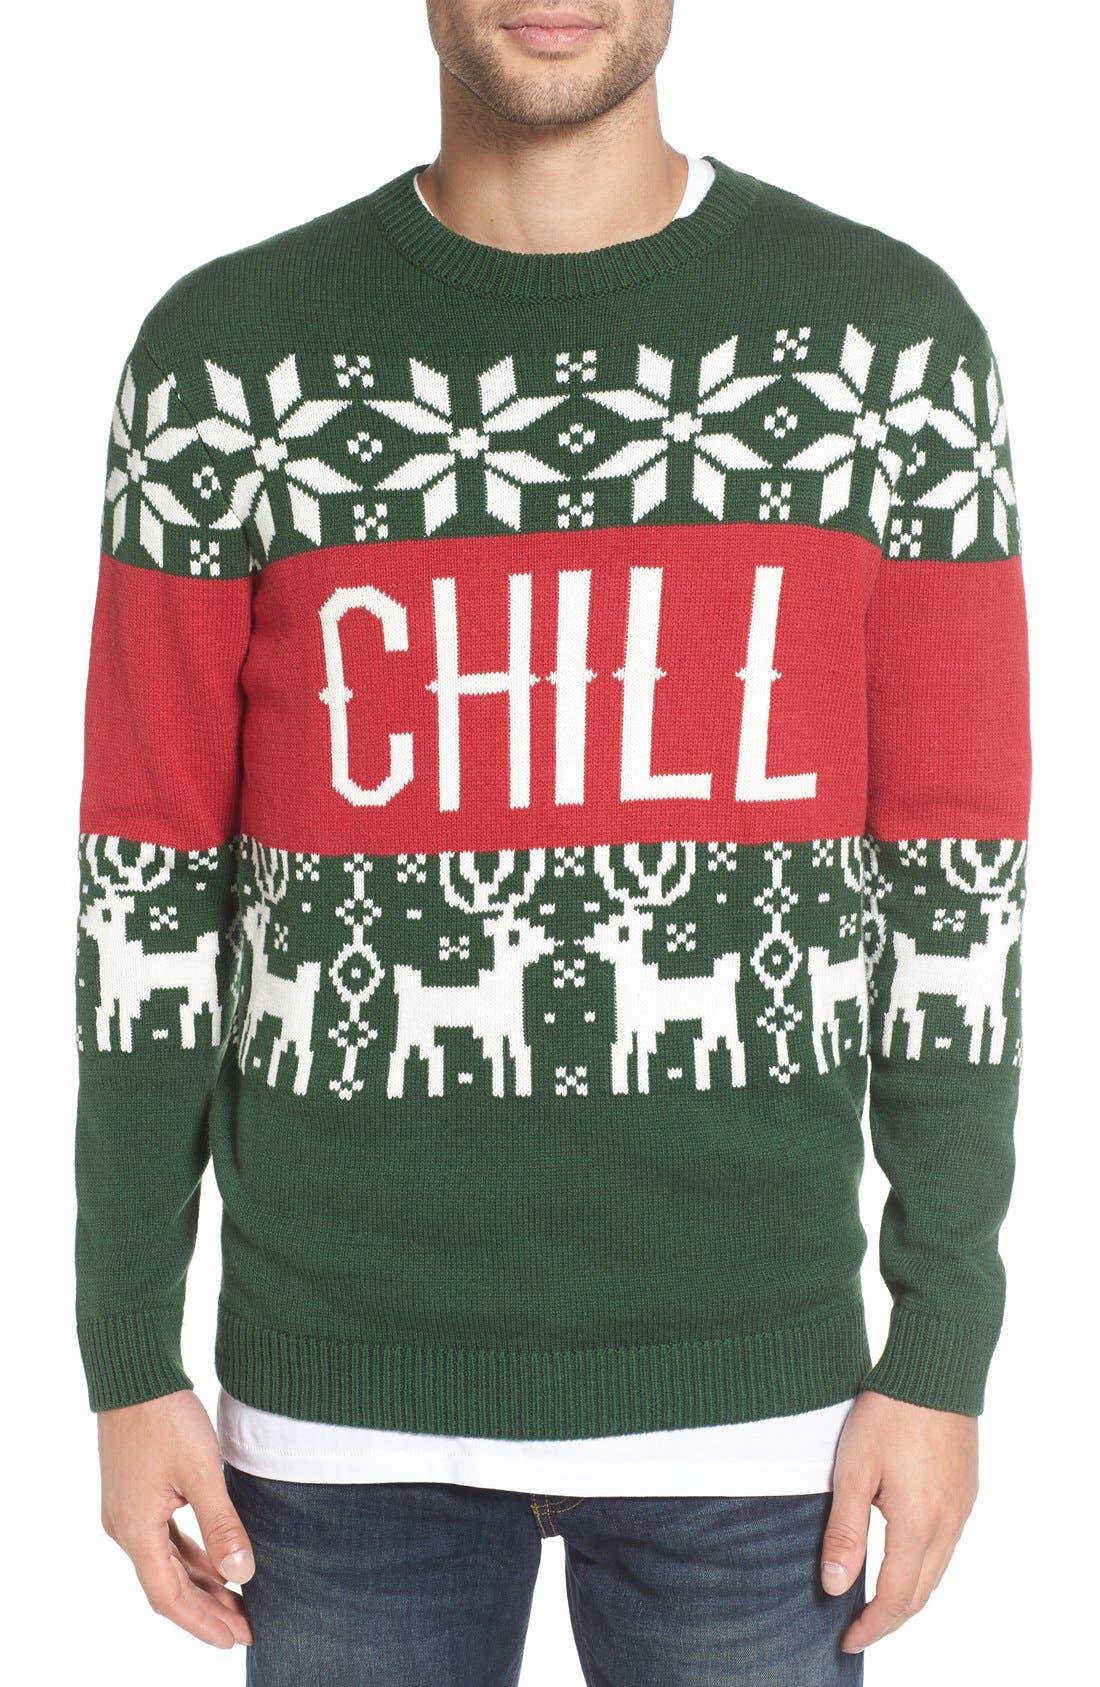 'Chill Vibes' Intarsia Crewneck Sweater,                             Main thumbnail 1, color,                             641